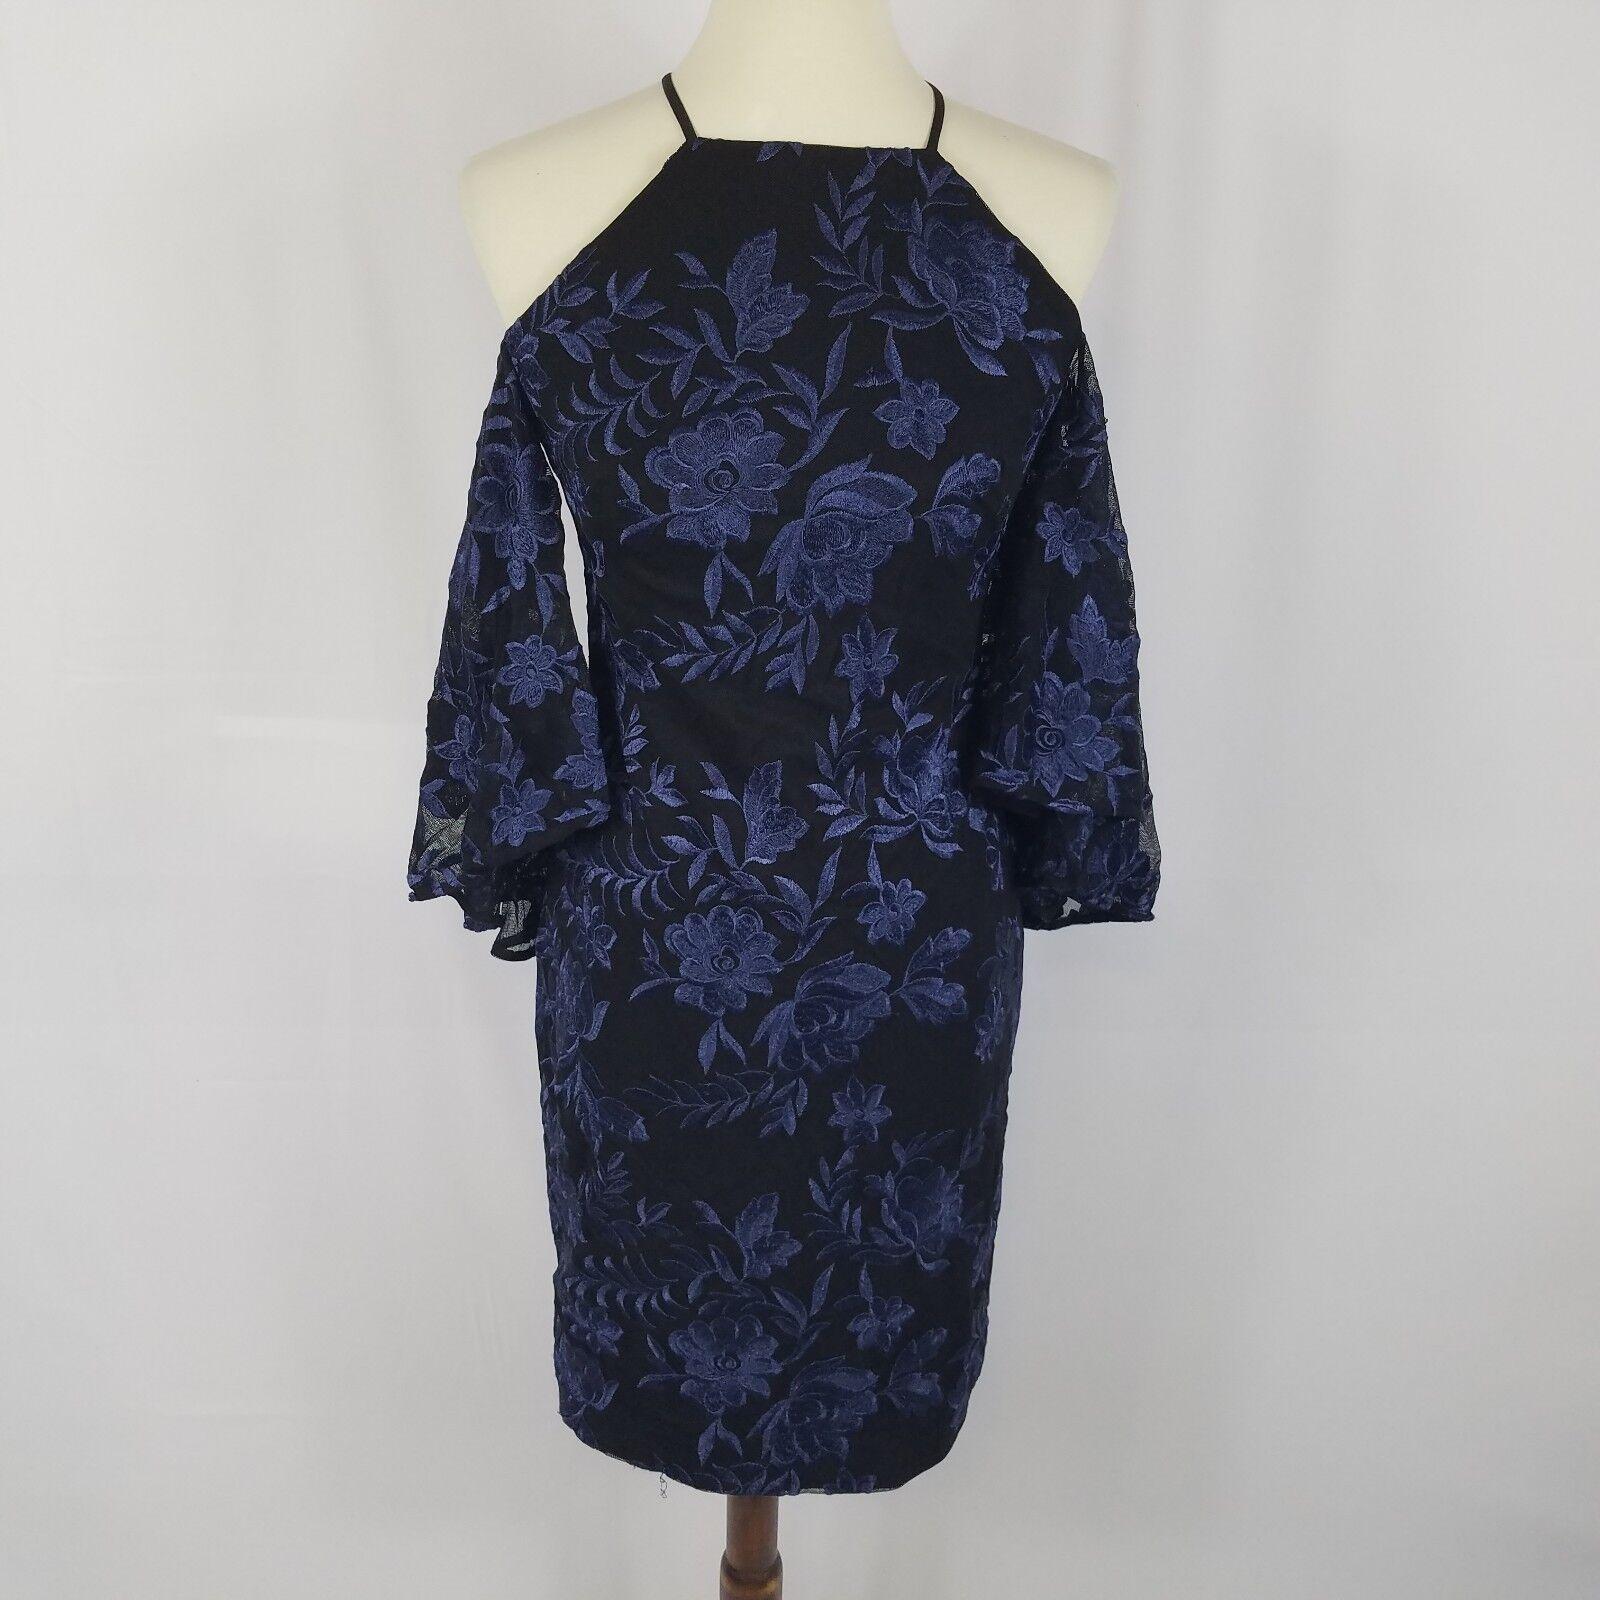 New Ralph Lauren cold shoulder dress Größe 4 schwarz Blau bell sleeves embroiderot